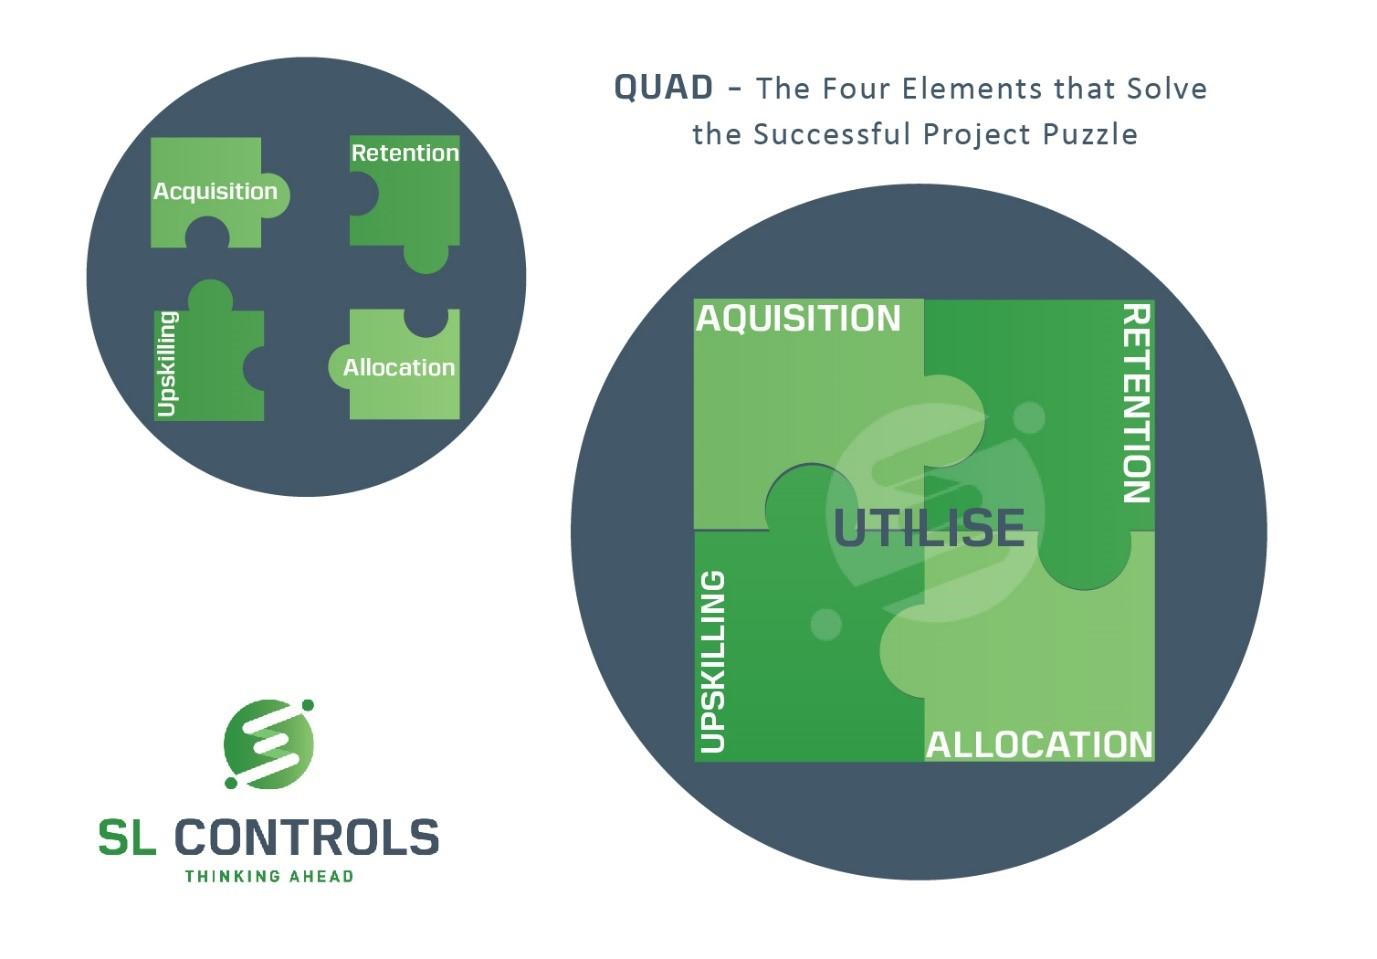 Utilise - Acquisition, Retention, Upskilling, and Allocation